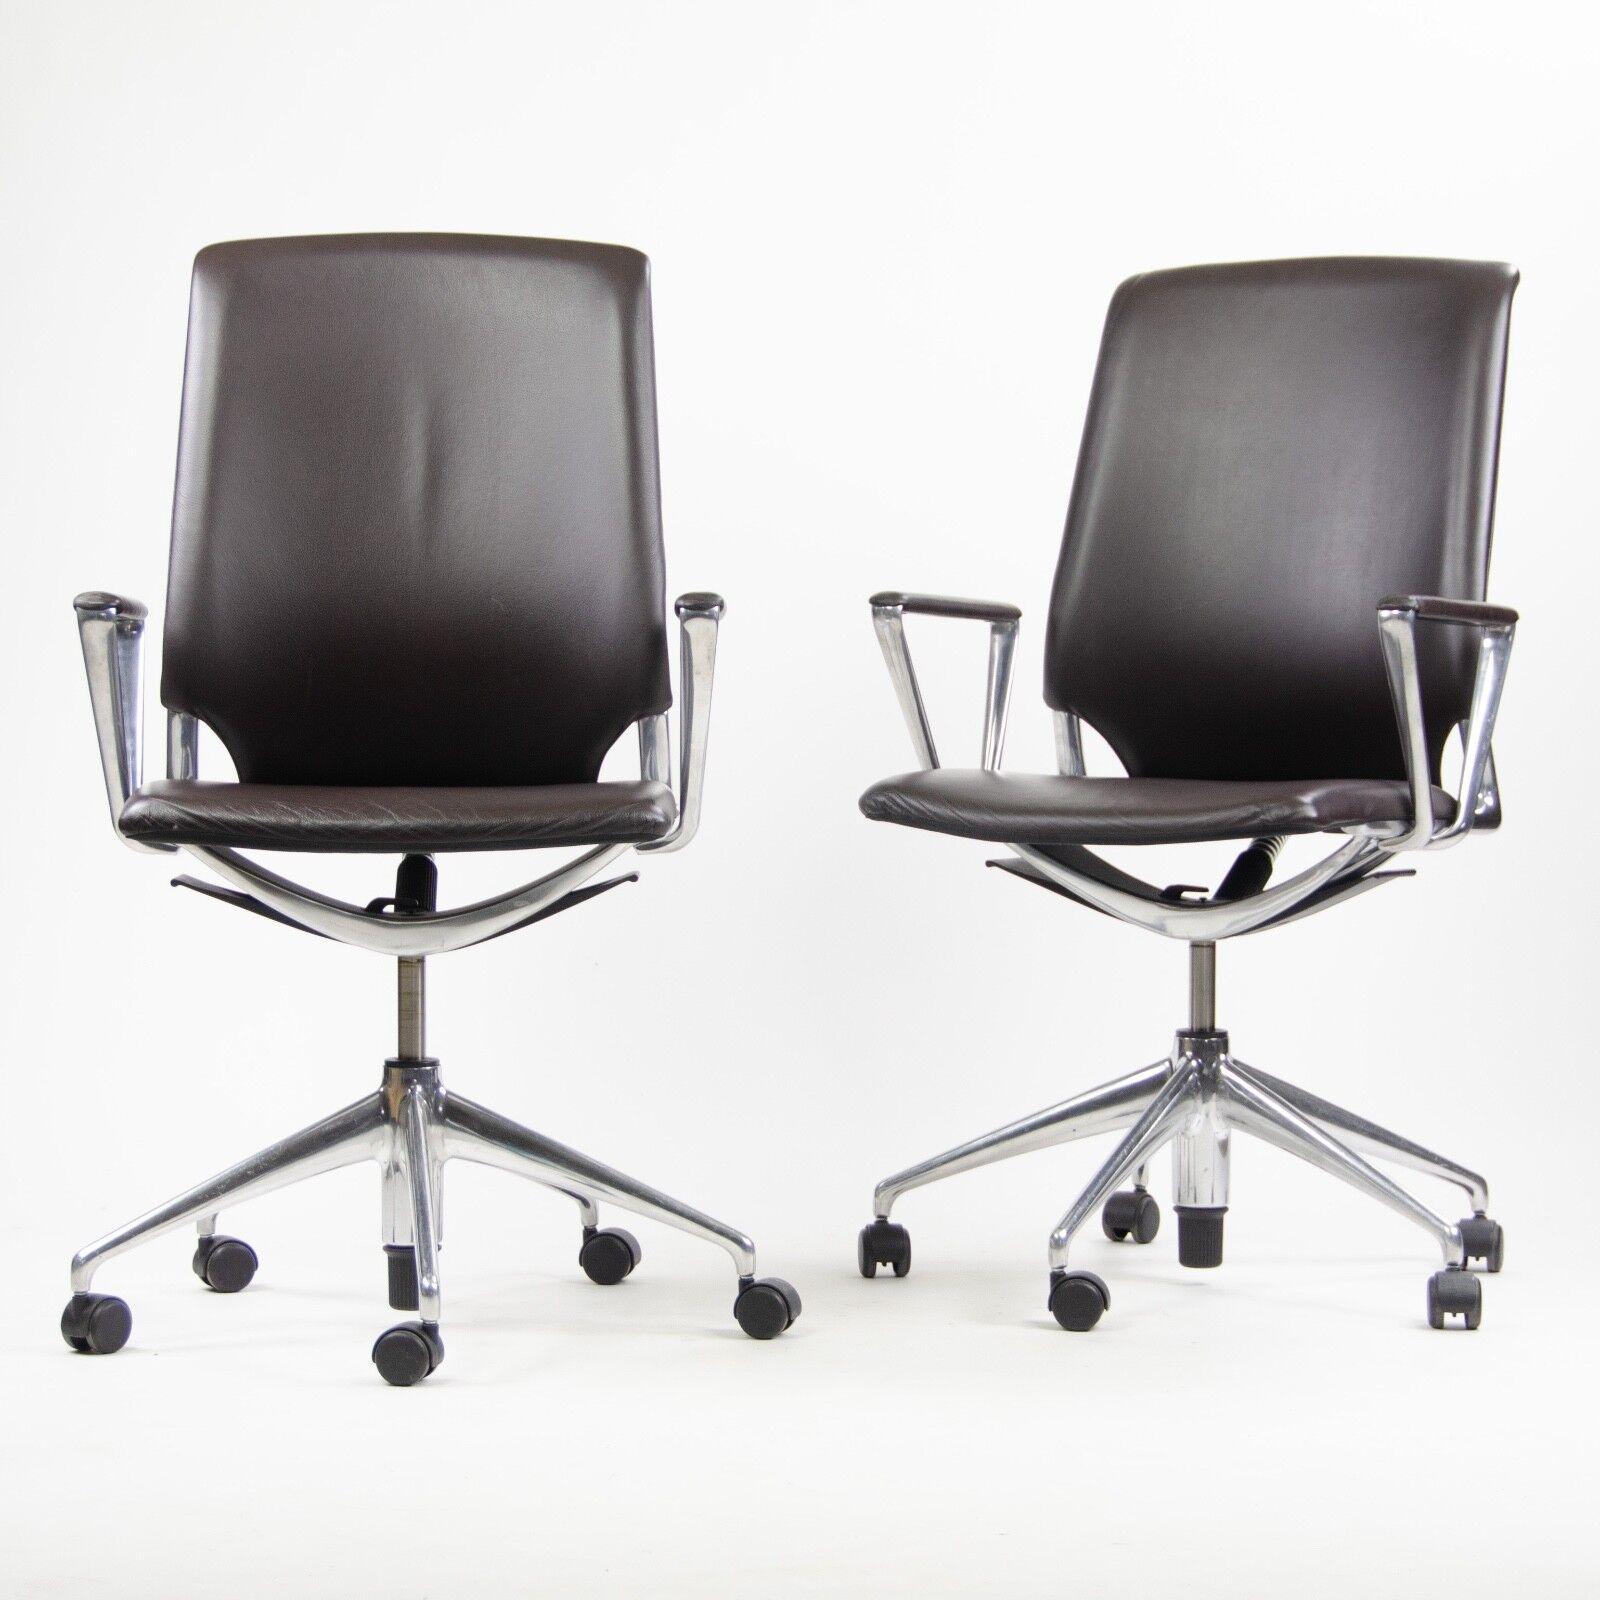 Alberto Meda Design.Details About Vitra Alberto Meda Desk Chair Brown Full Leather Knoll Herman Miller 16x Avail